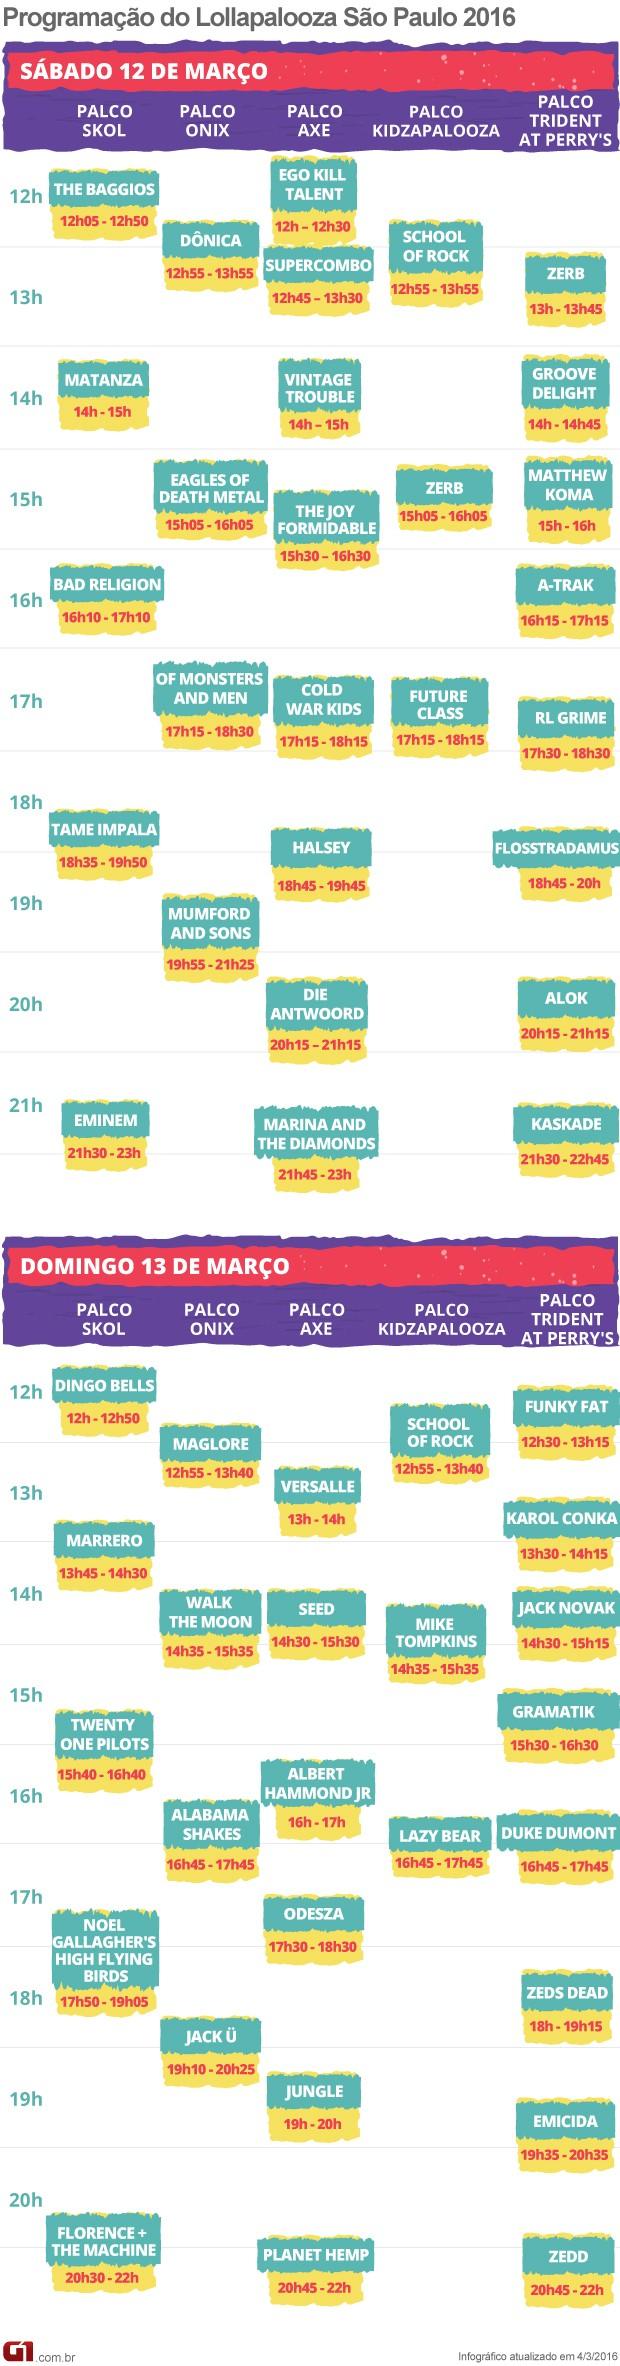 Programação do Lollapalooza 2016 (Foto: Arte/G1)